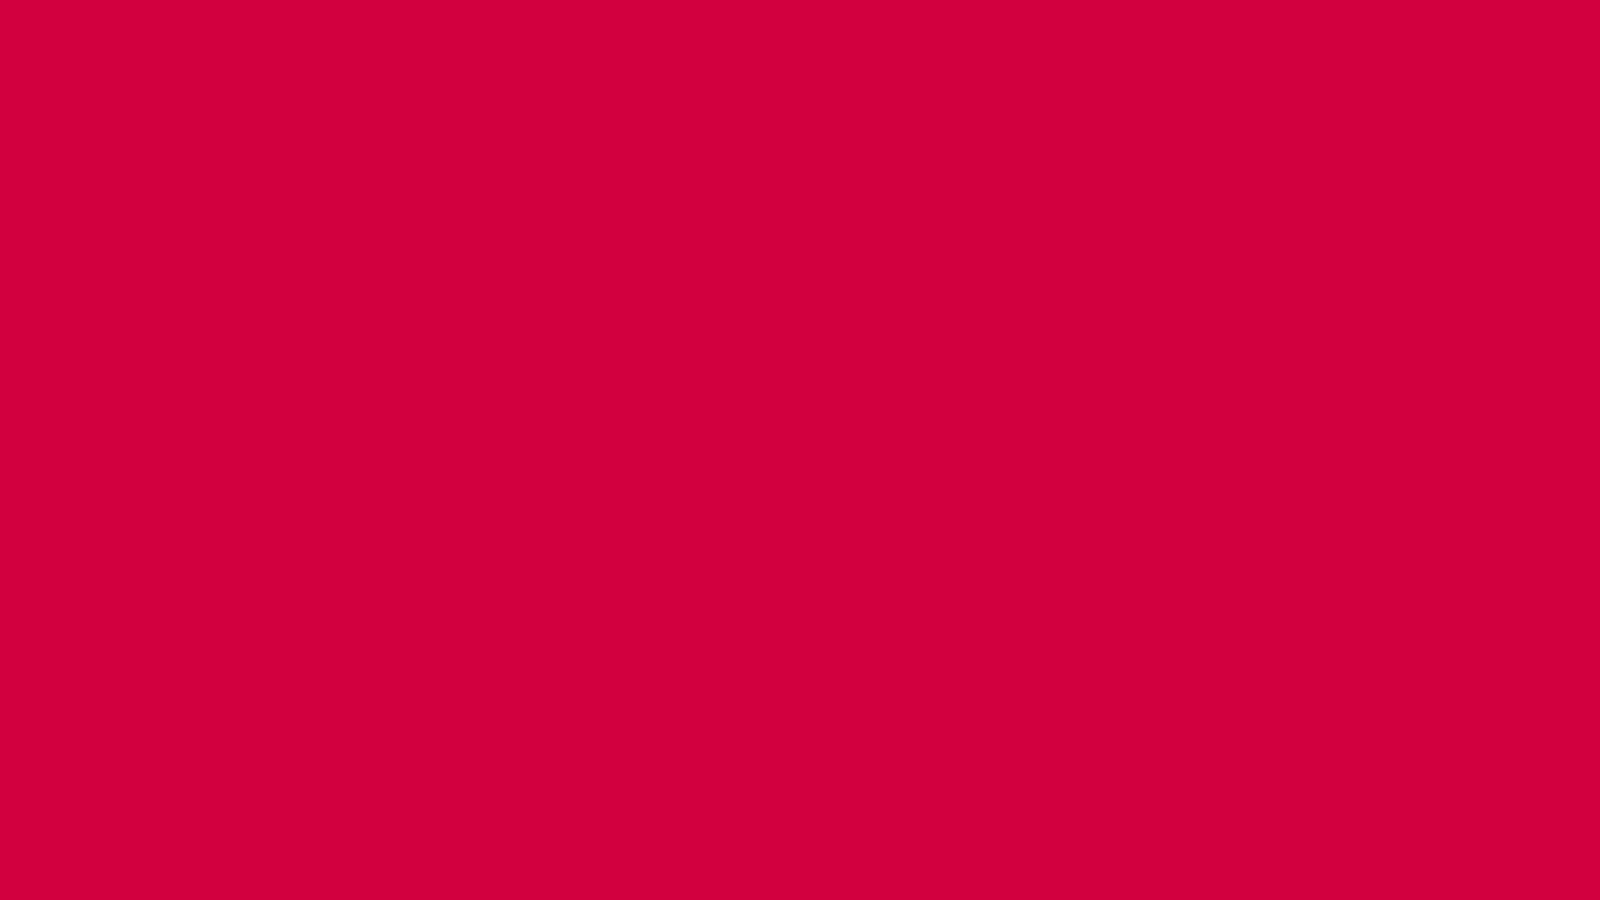 1600x900 Utah Crimson Solid Color Background